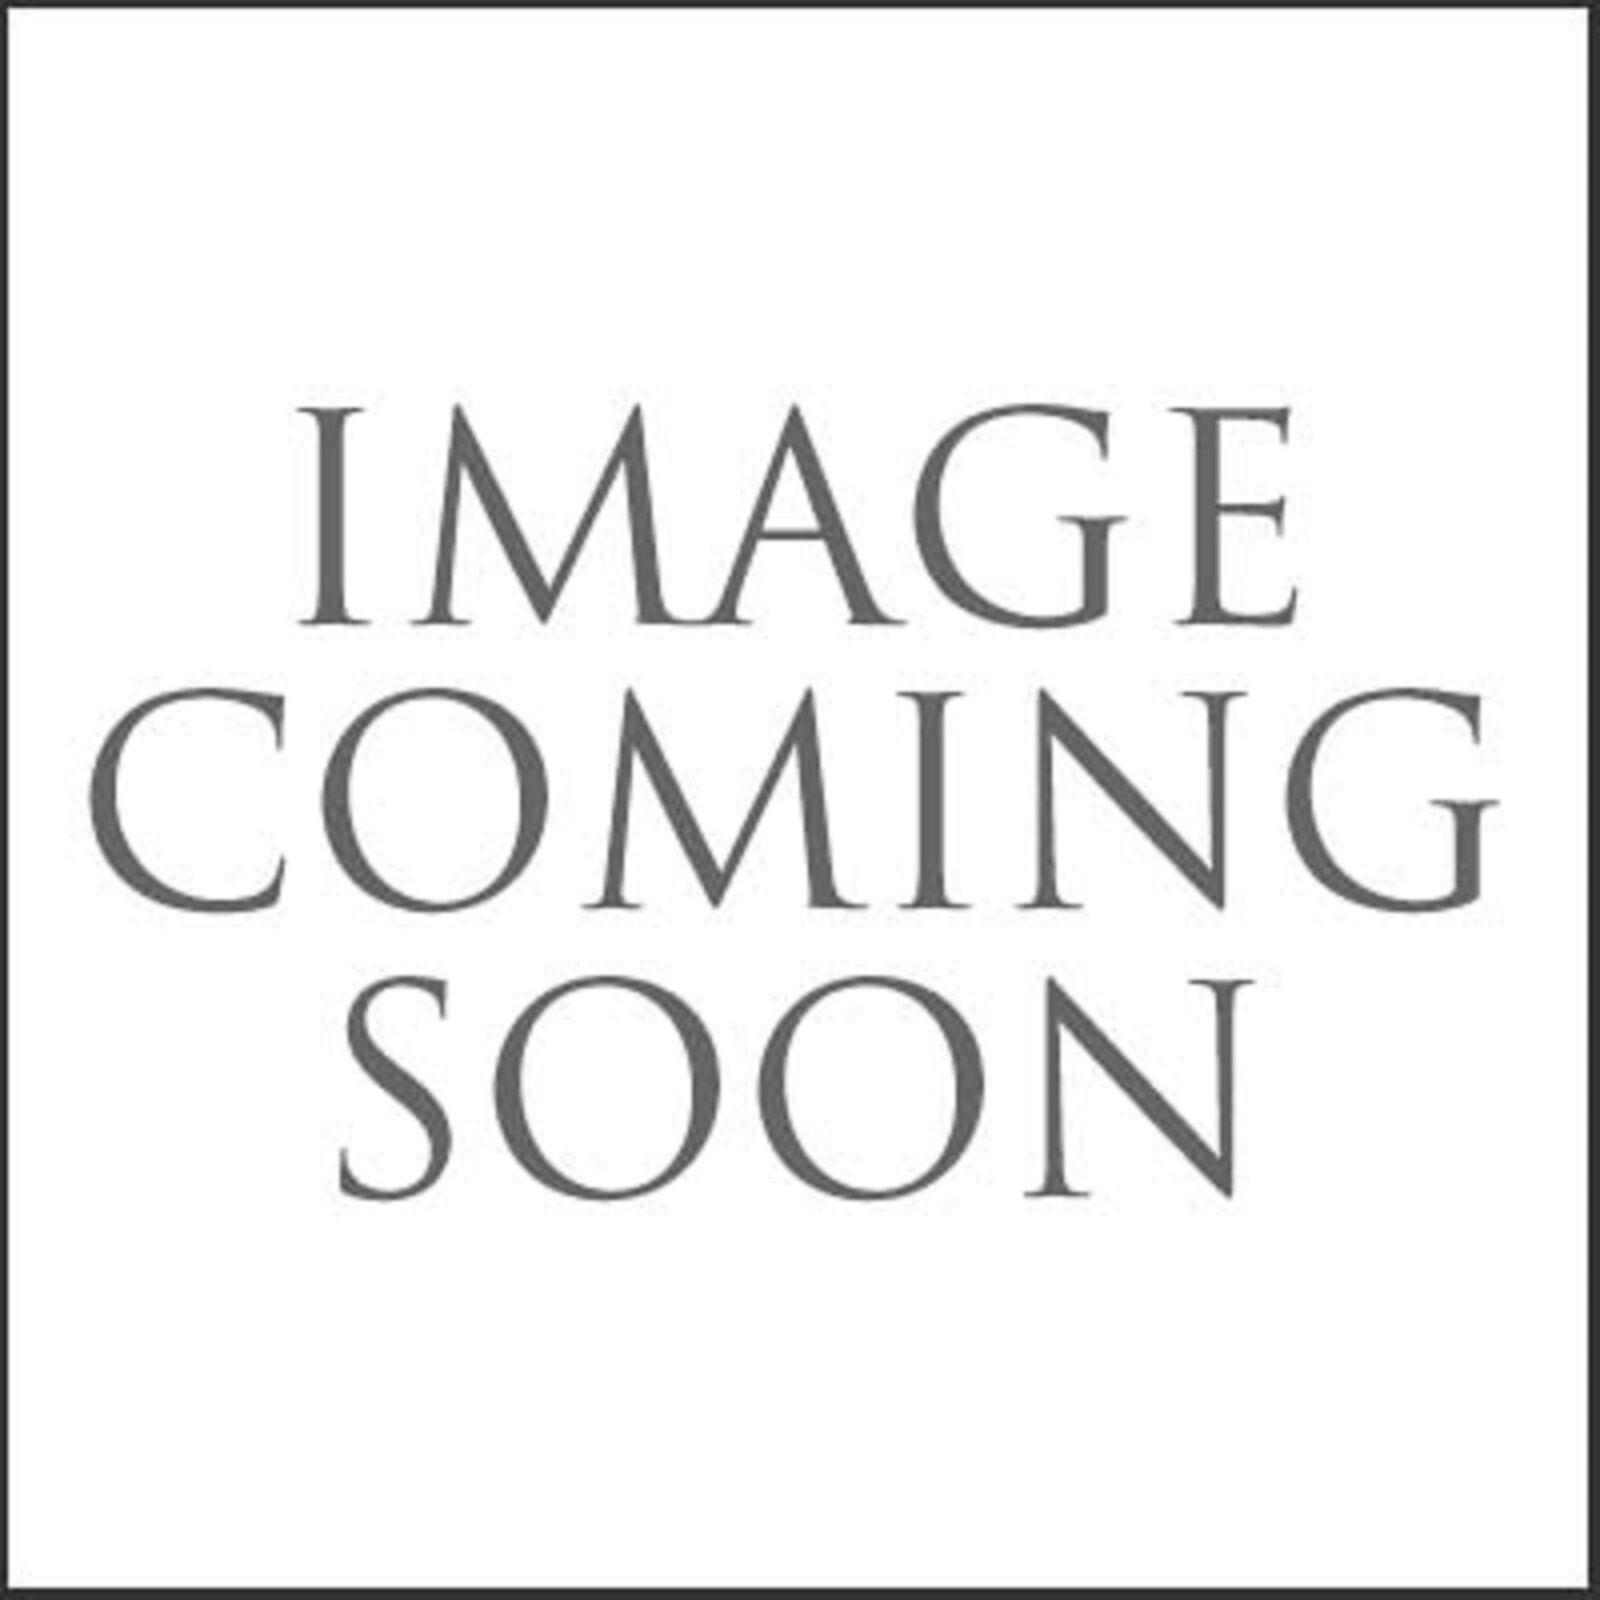 Shimano Slx FC-M7000-B1 11 Velocità 170 mm Guarnitura senza IFCM7000BCXX